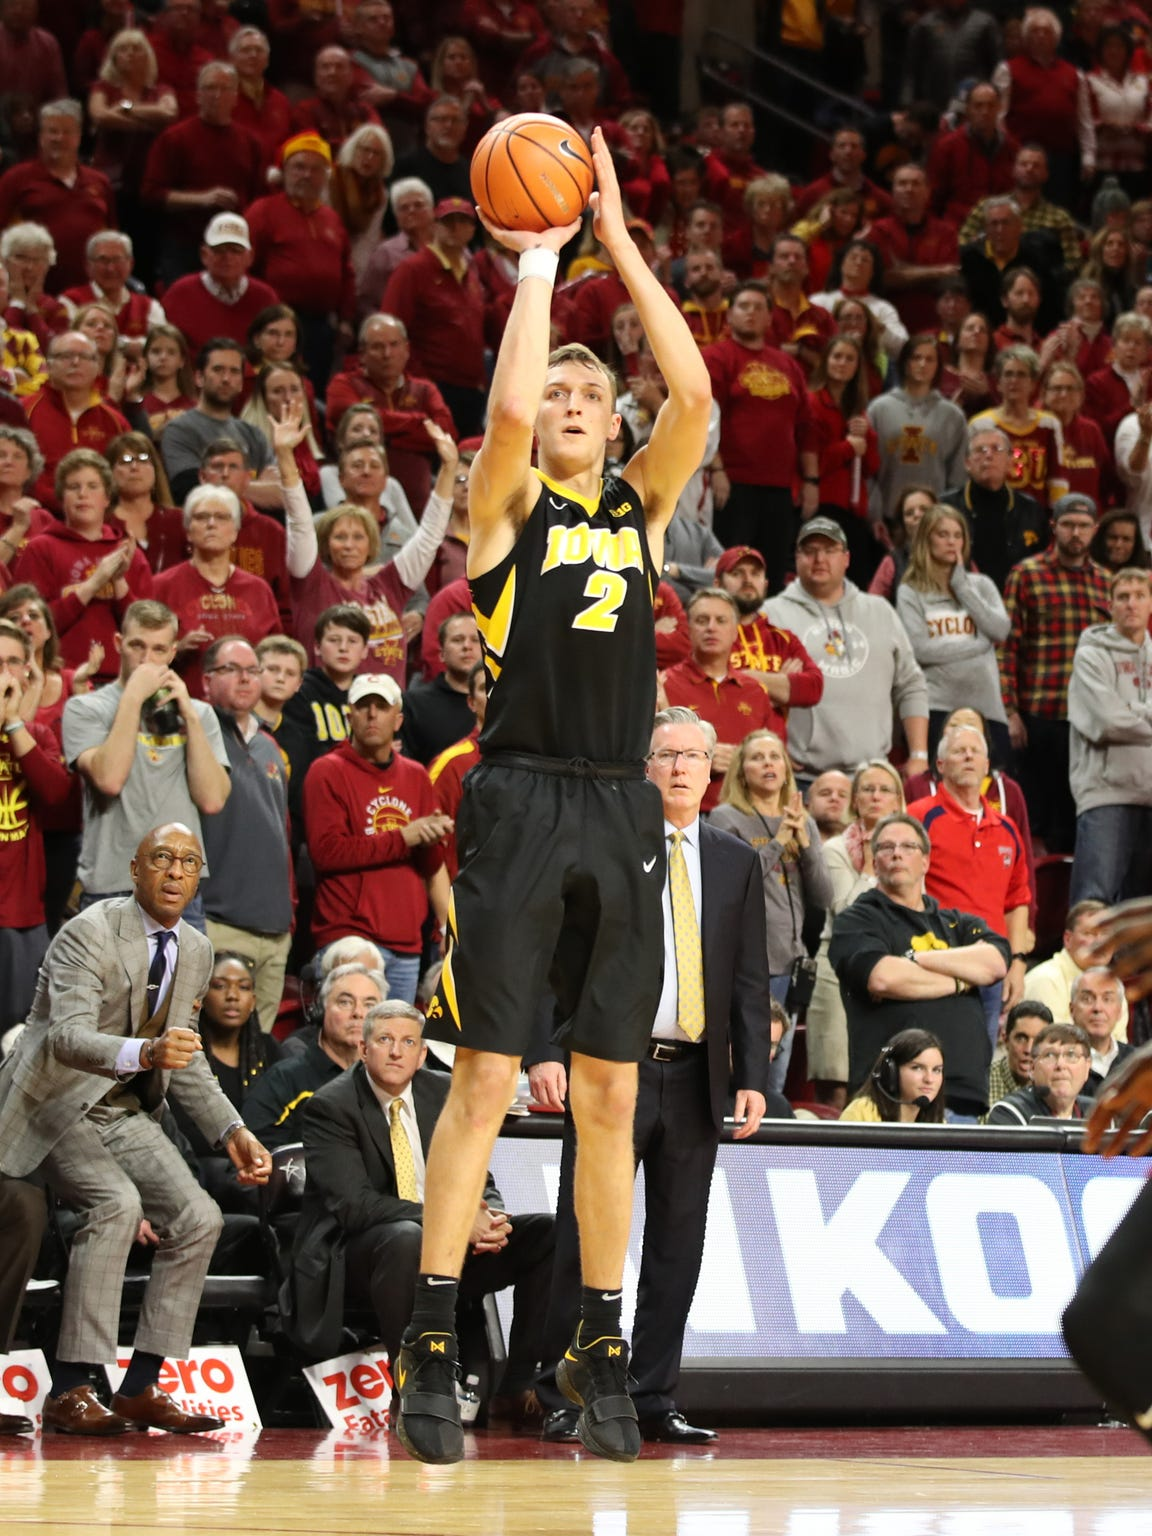 Jack Nunge (2) shoots a three pointer against the Iowa